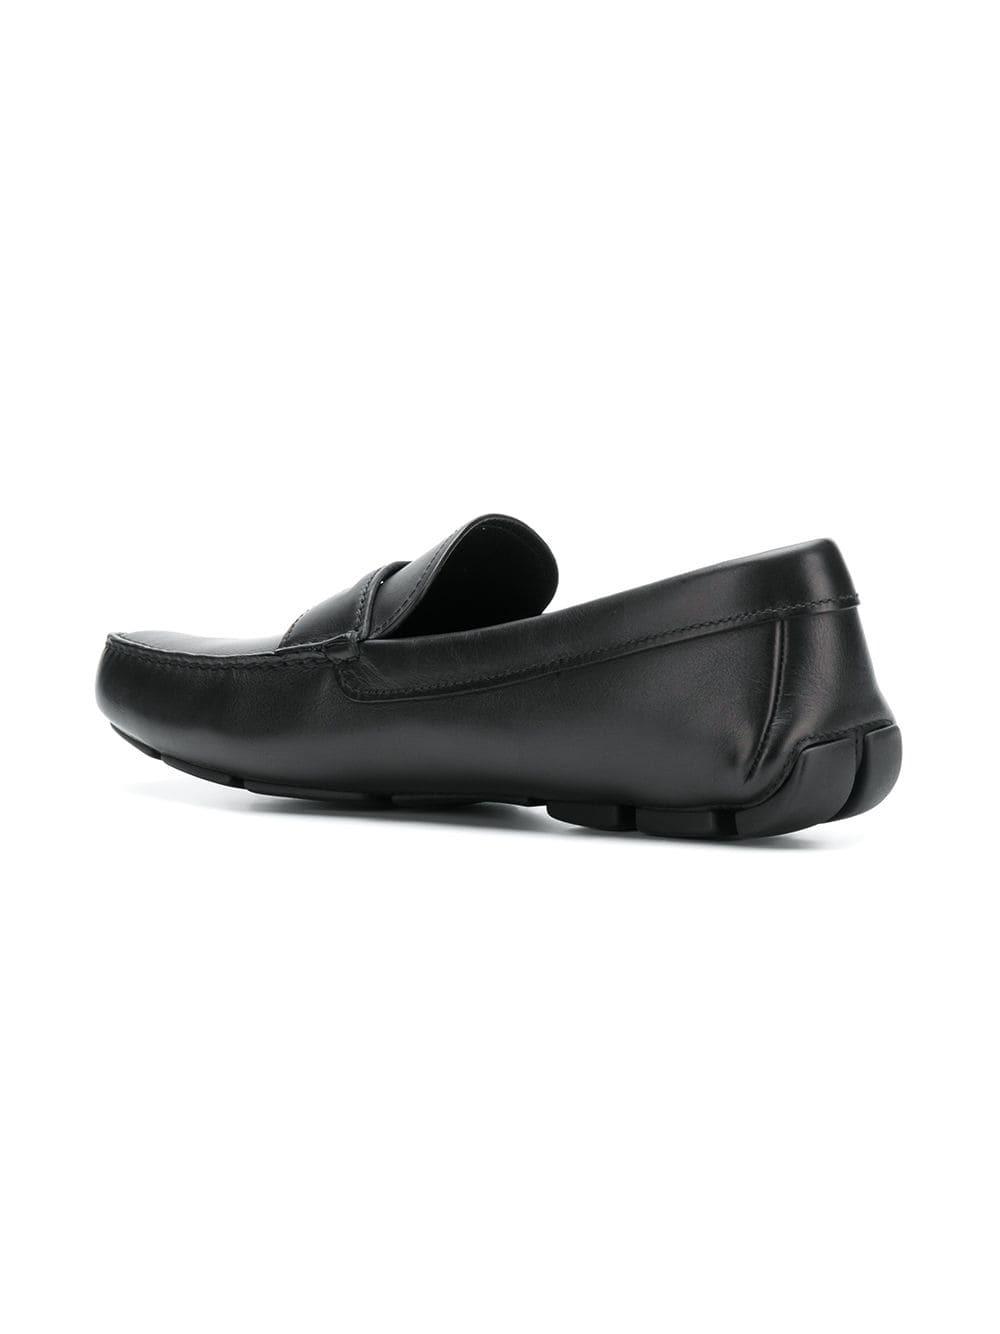 6ca1db07 £421, Prada Slip On Loafers